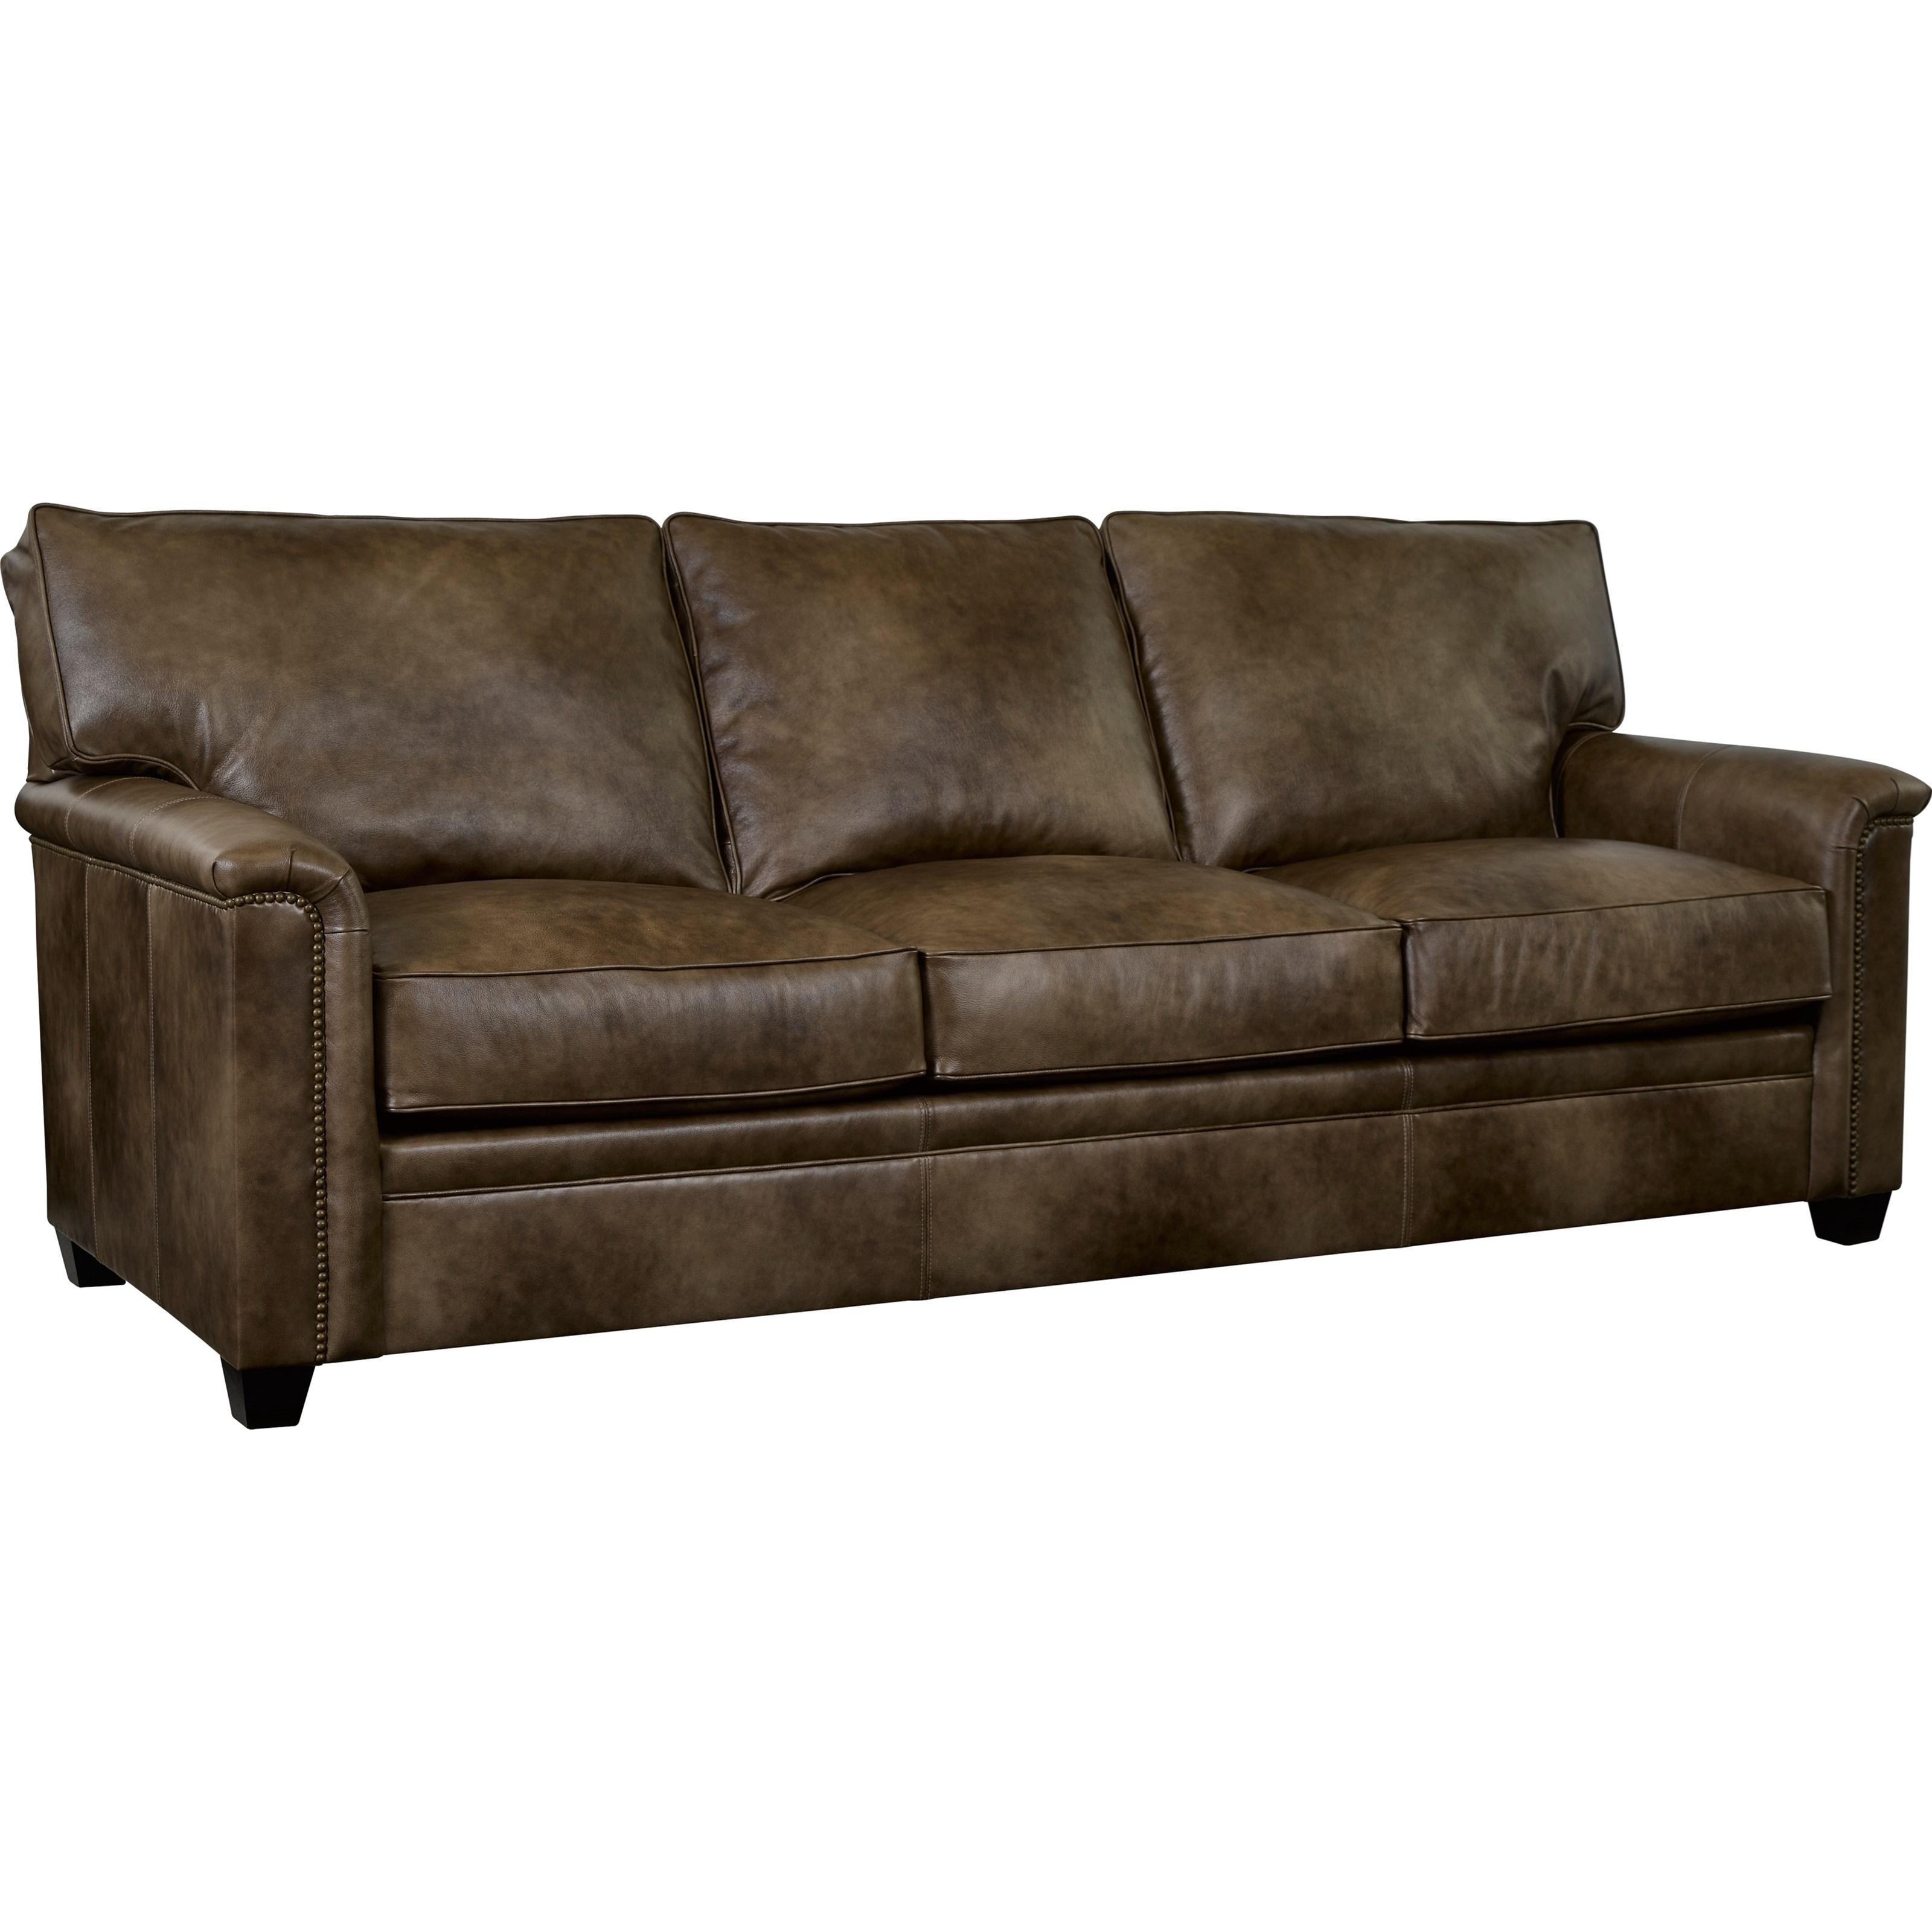 leather sleeper sofa with nailheads sectional storage broyhill furniture warren nailhead trim accents and air dream mattress bullard sofas fayetteville nc